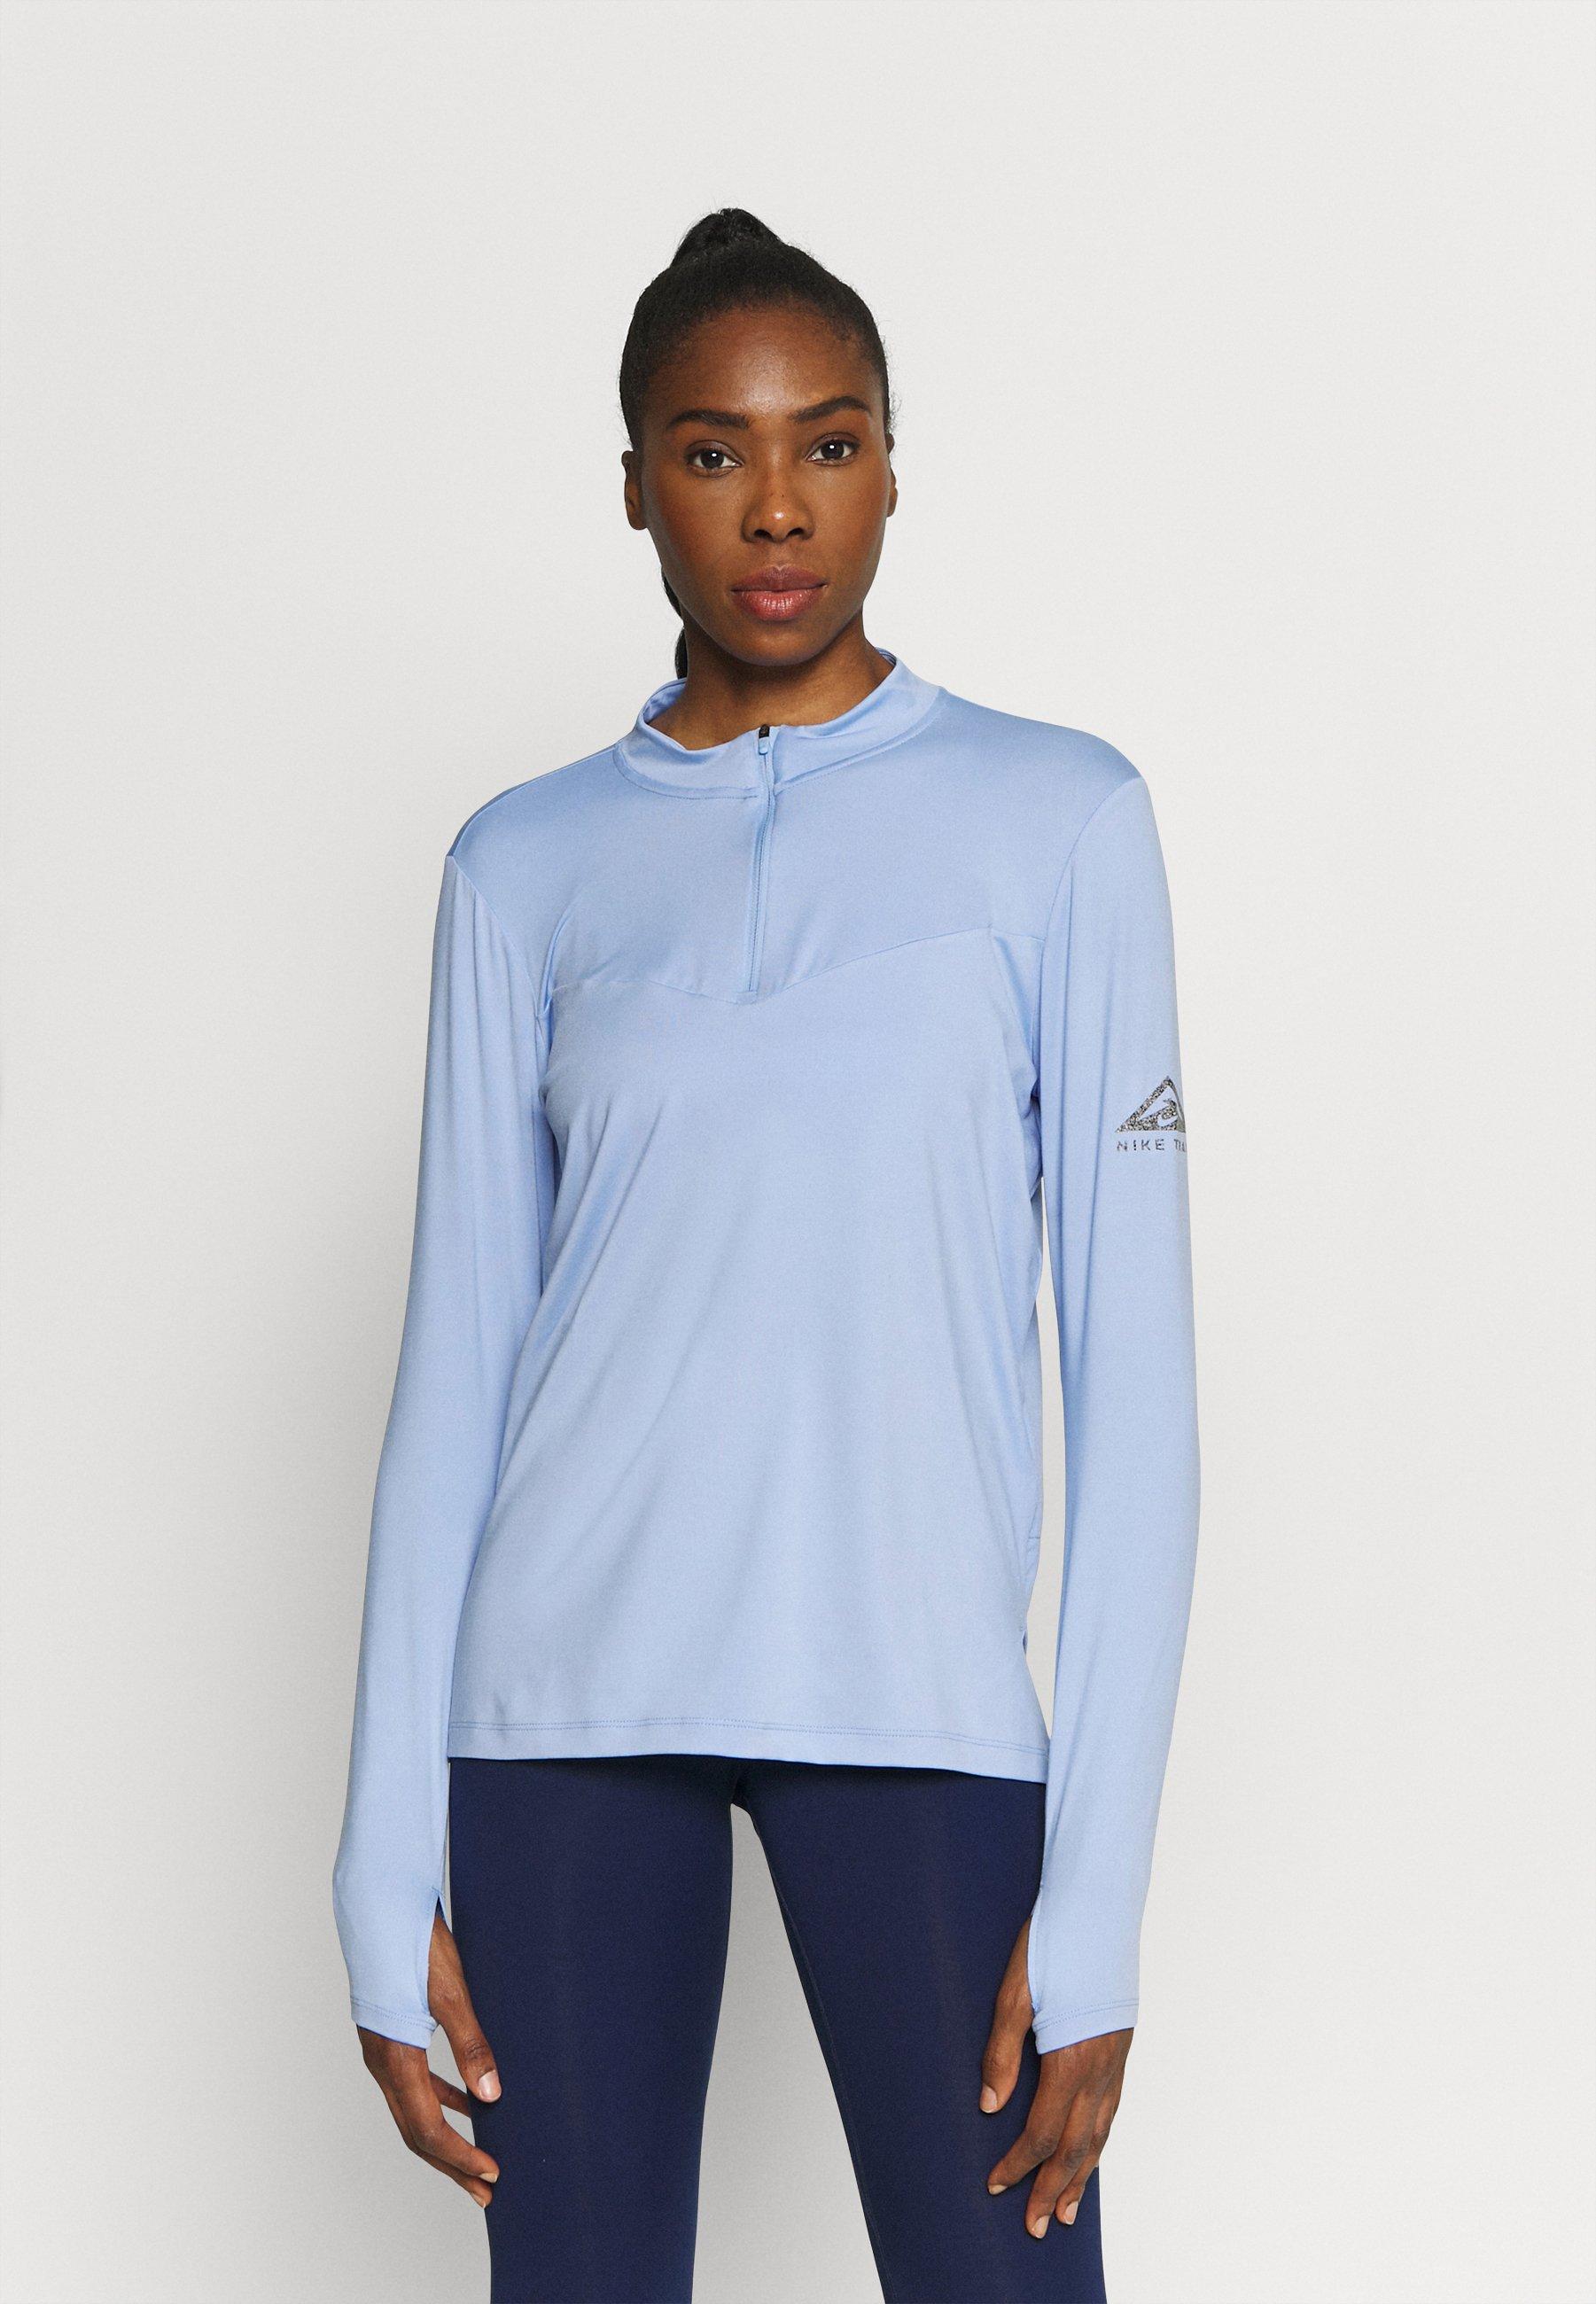 Femme ELEMENT TRAIL MIDLAYER - T-shirt de sport